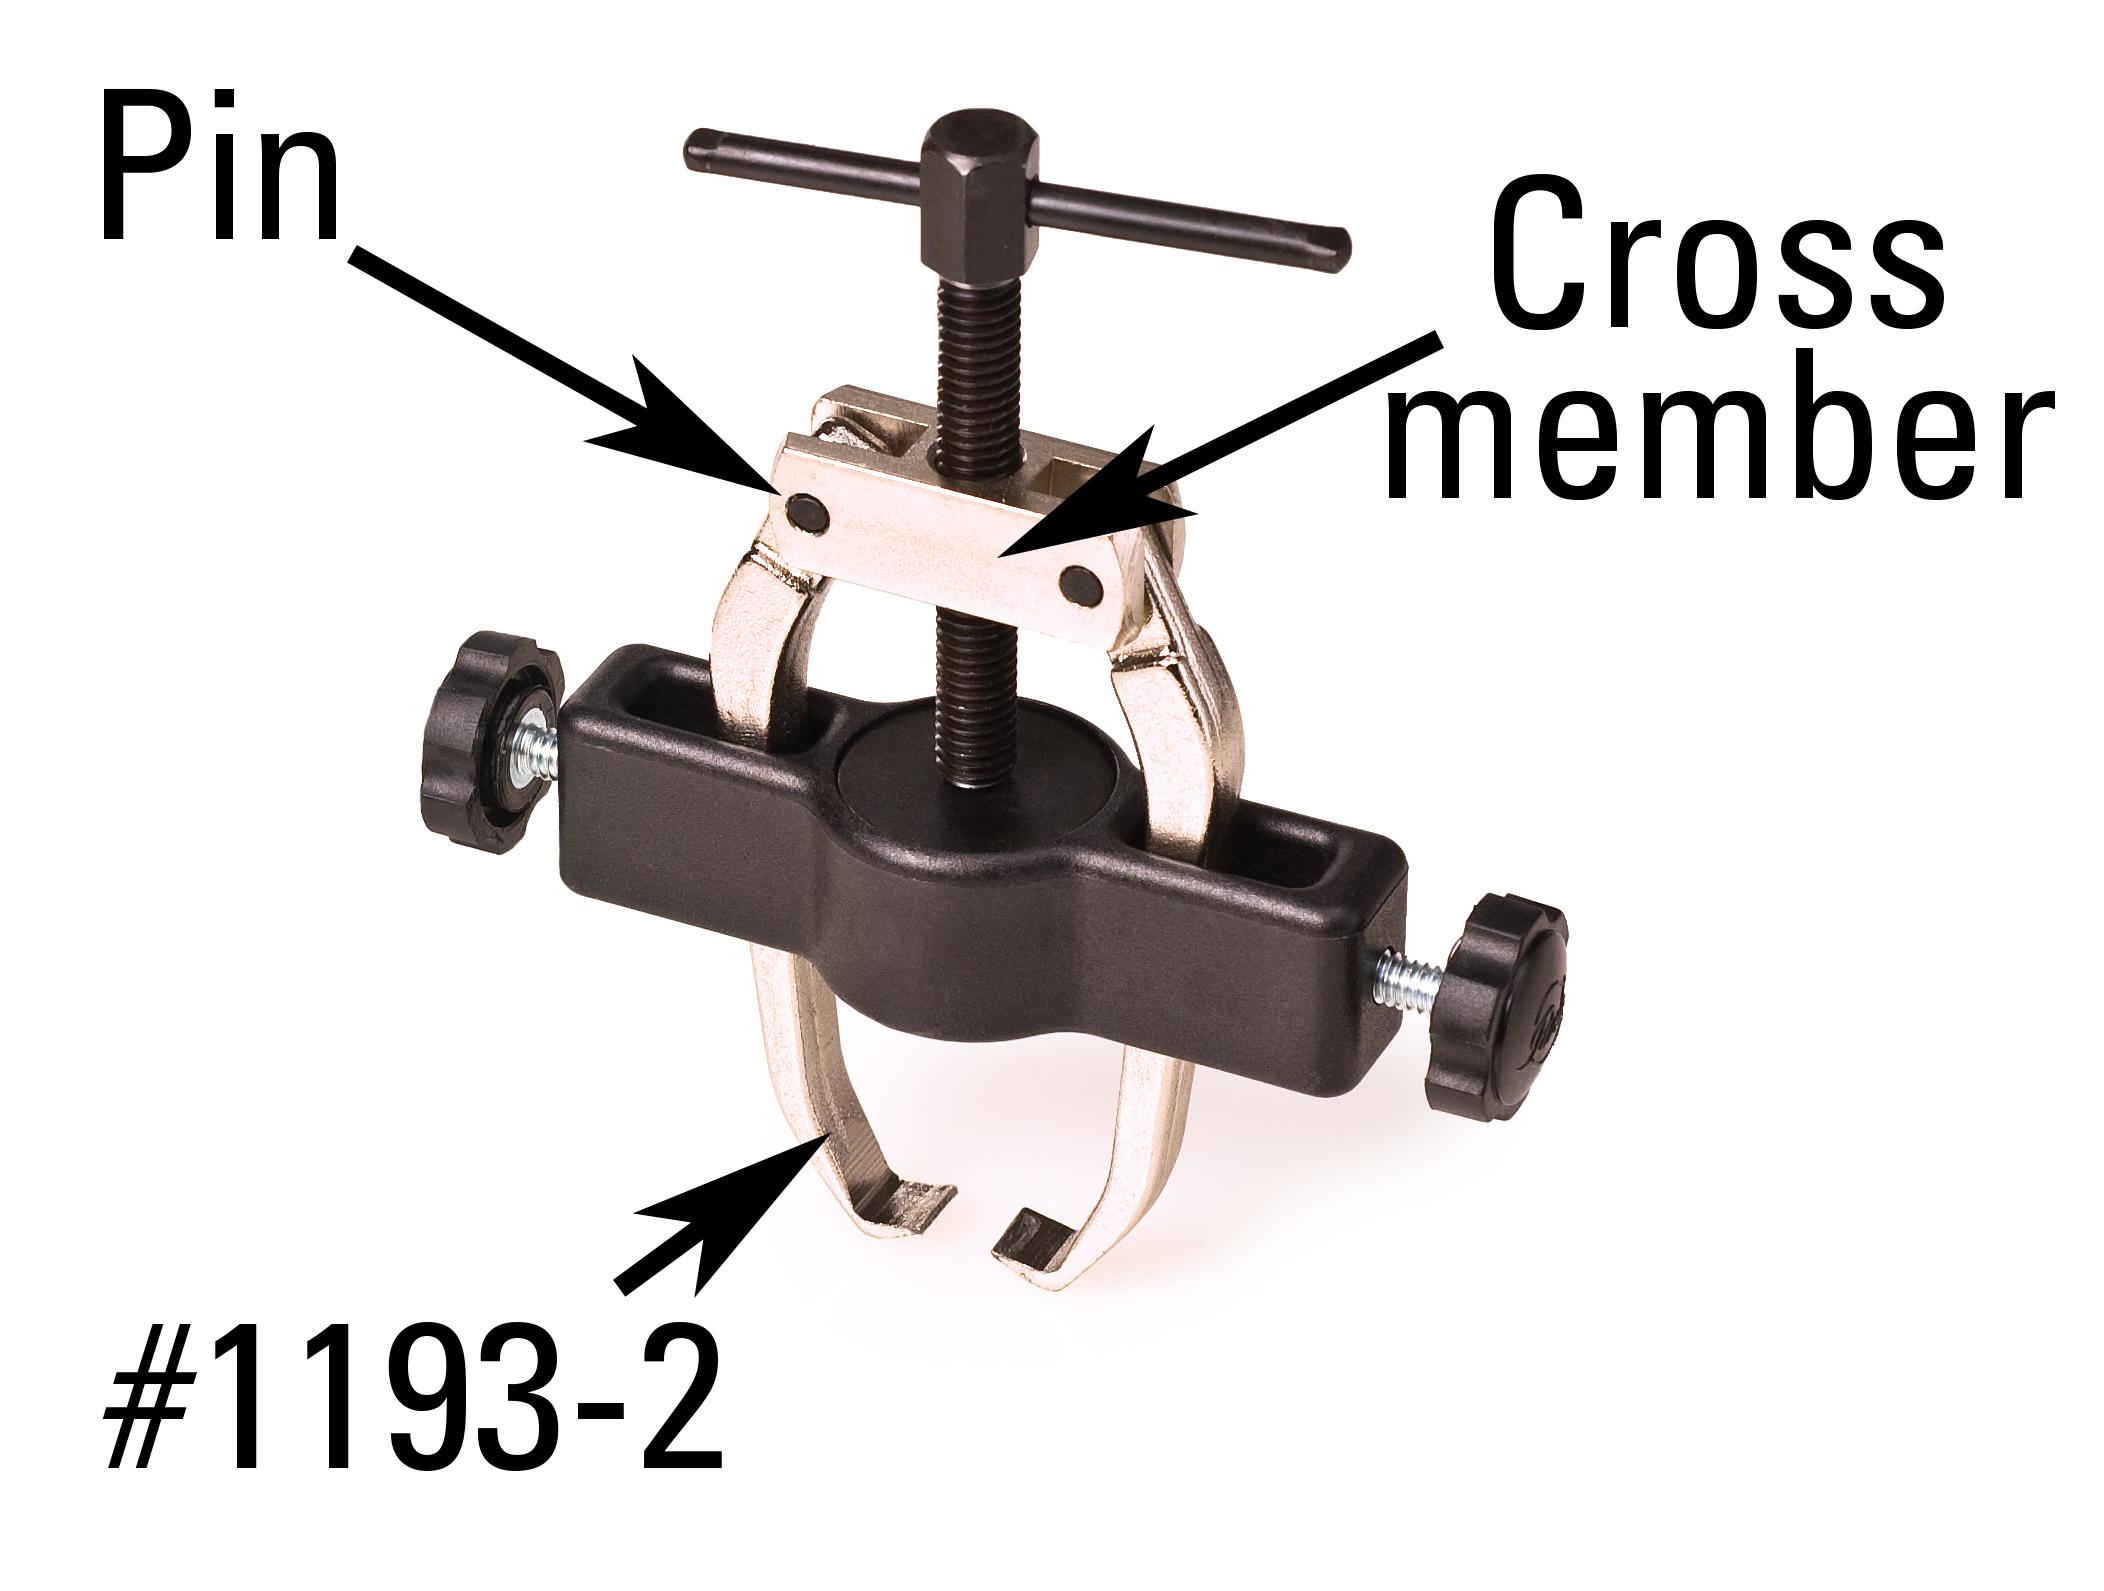 Figure 1. CPB-3 puller